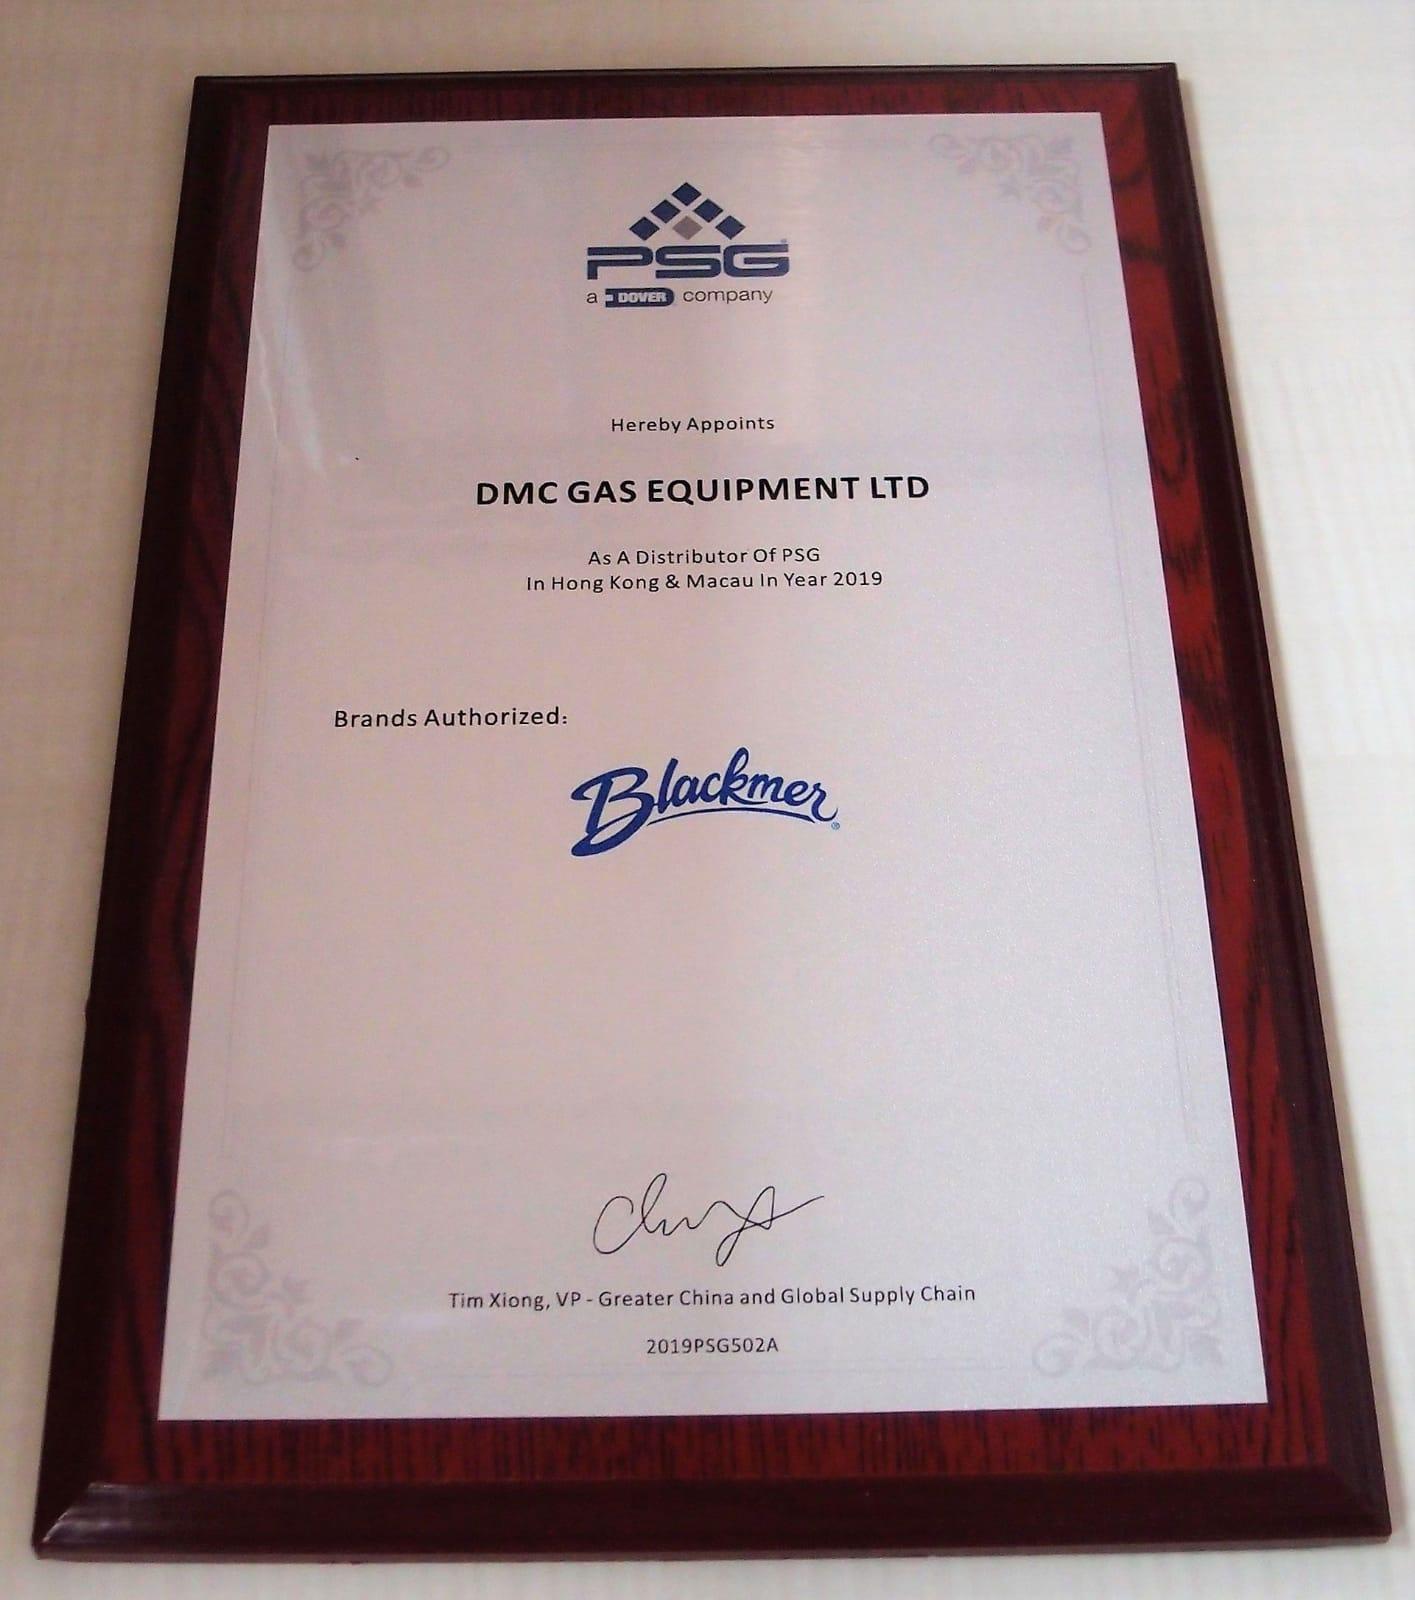 Blackmer - Certificate of Distributor of PSG